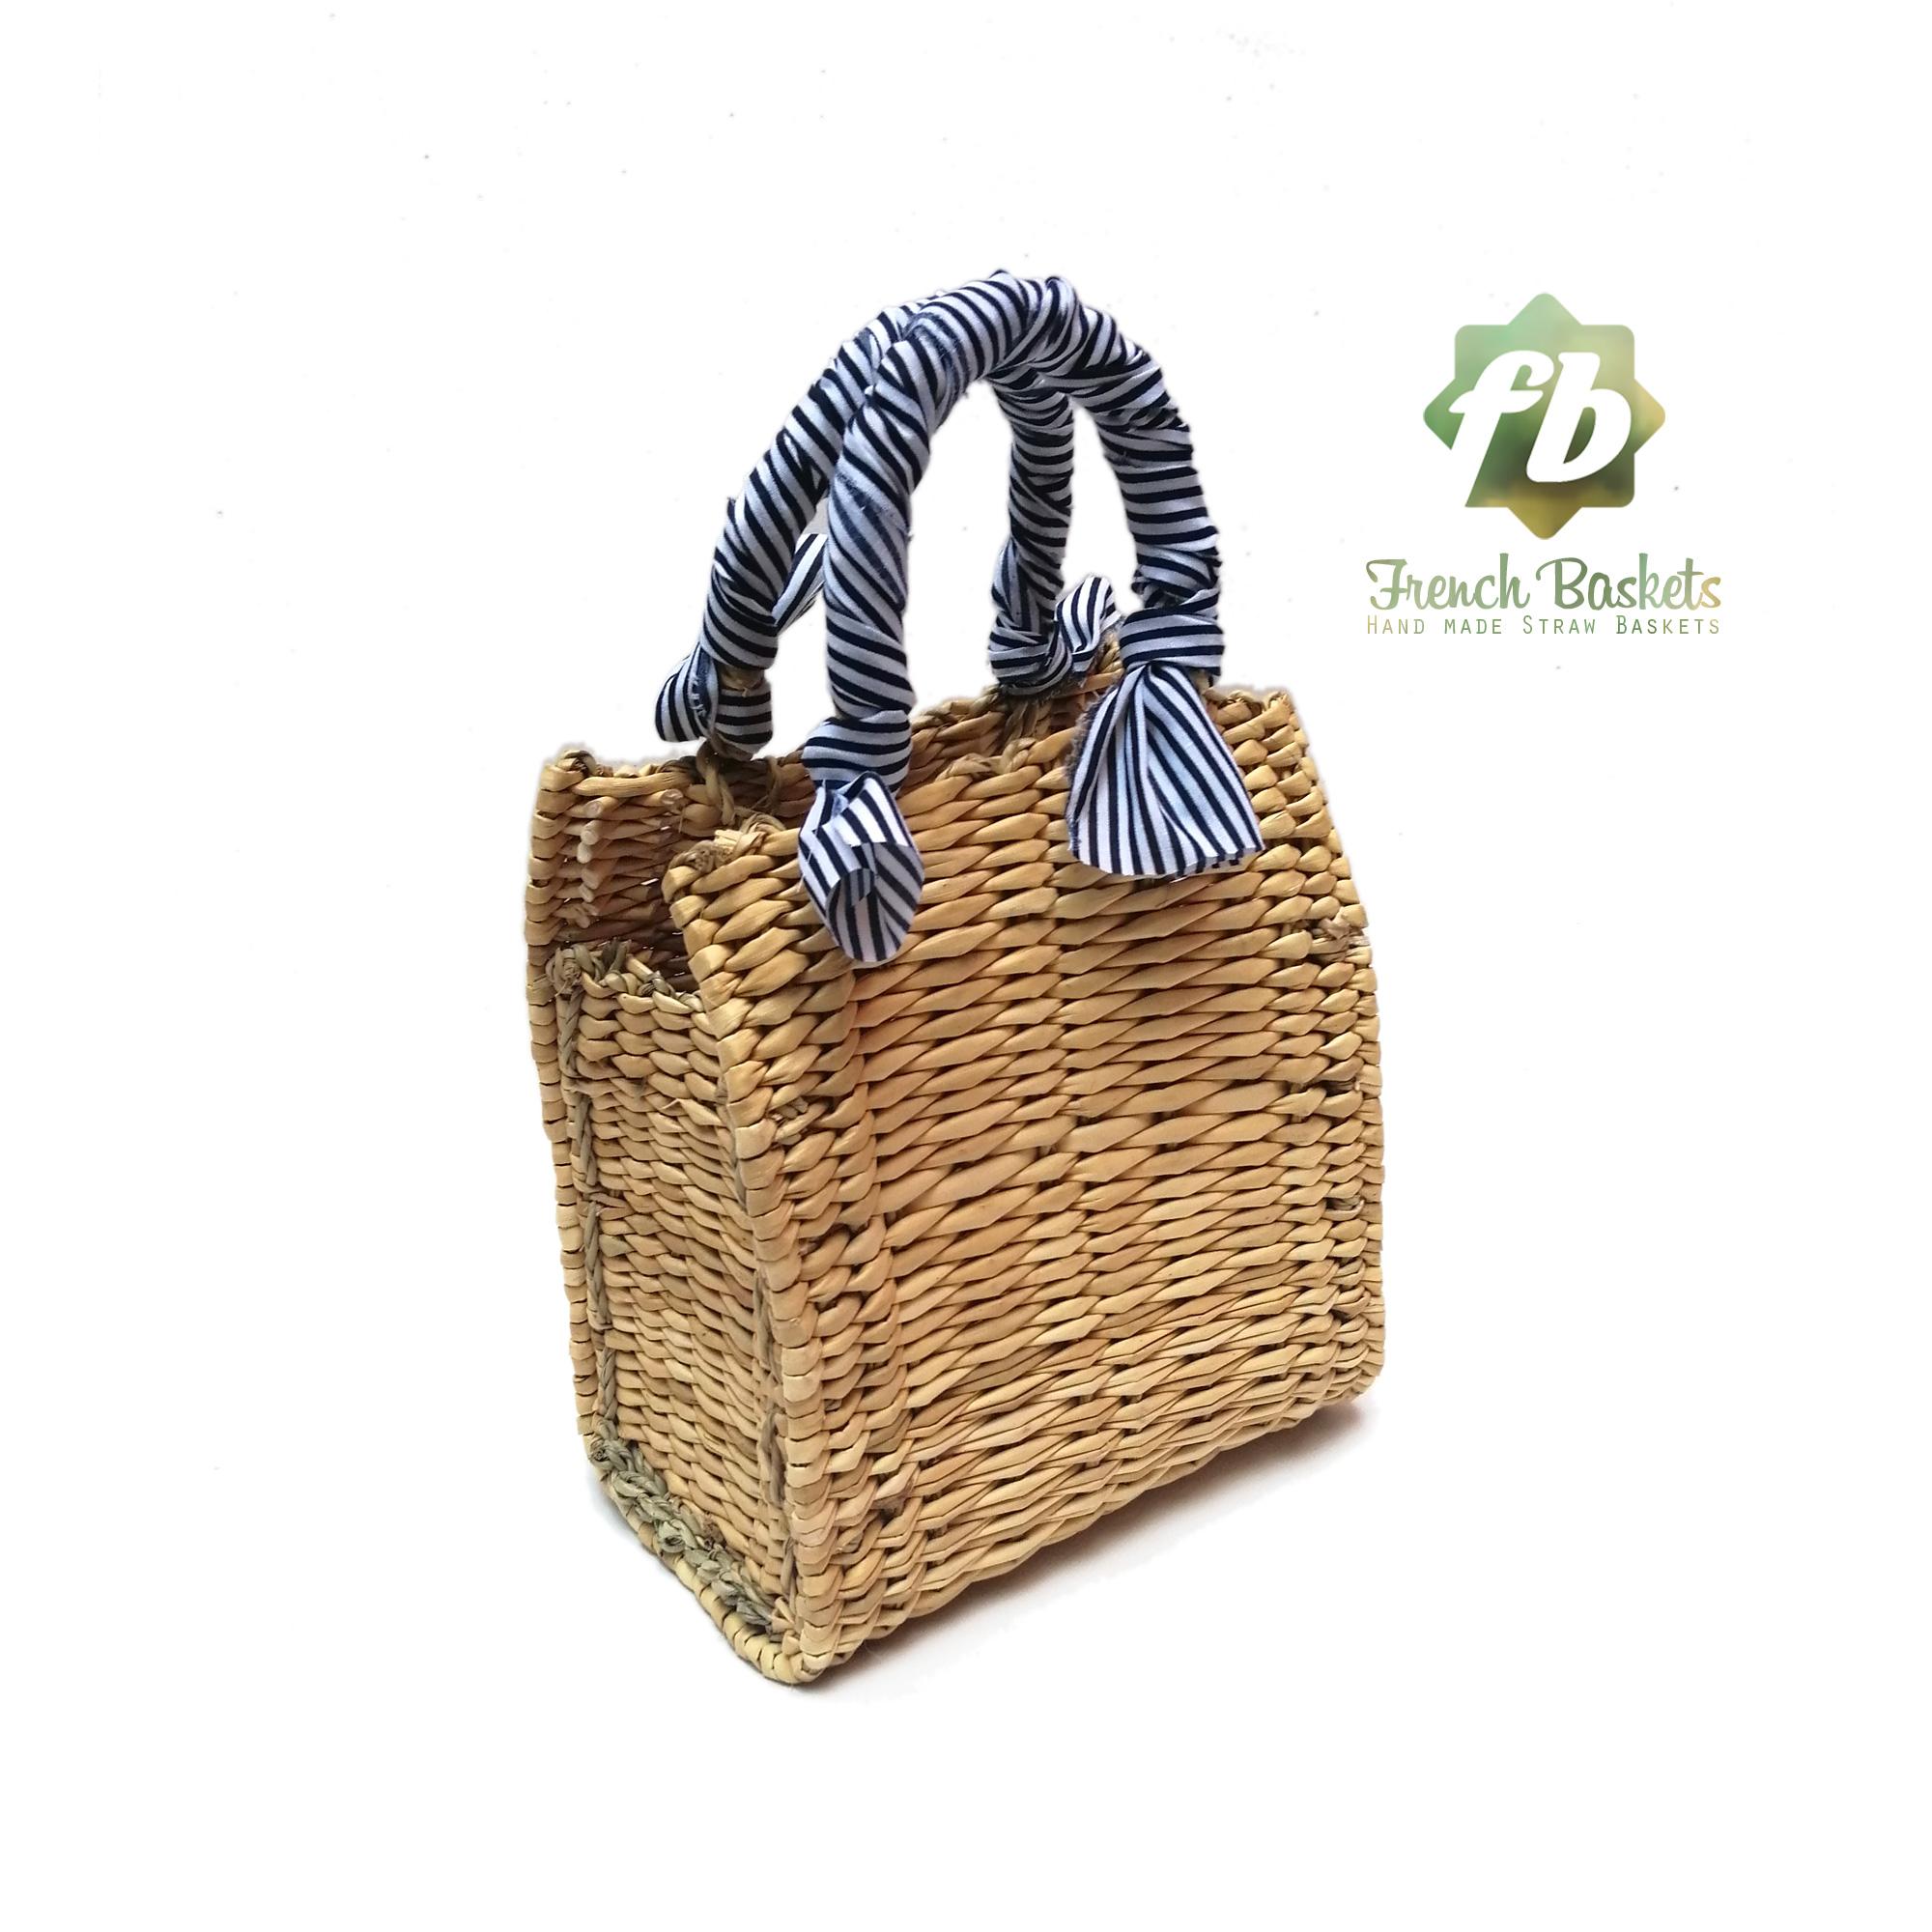 Straw handbag french baskets blue